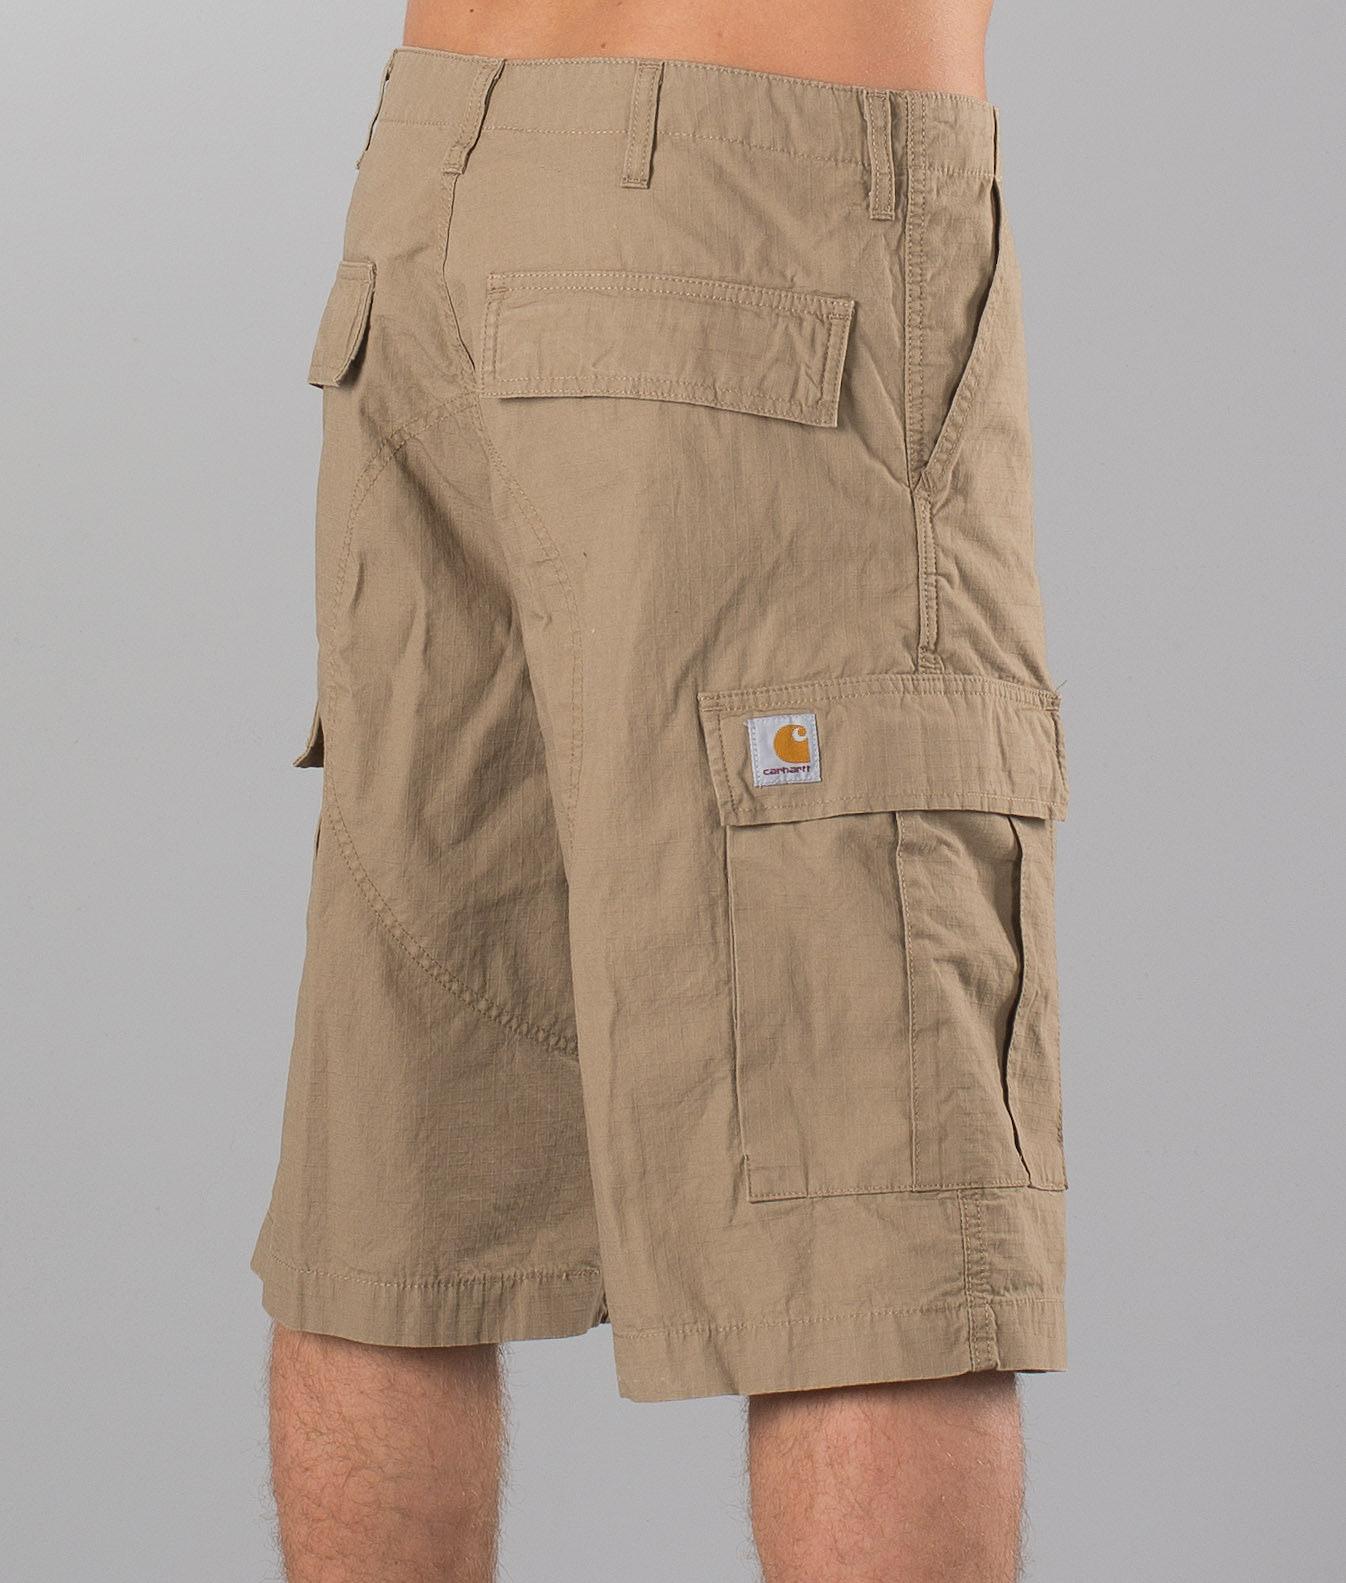 c65f29bc47 Carhartt Cargo Shorts Leather - Ridestore.com